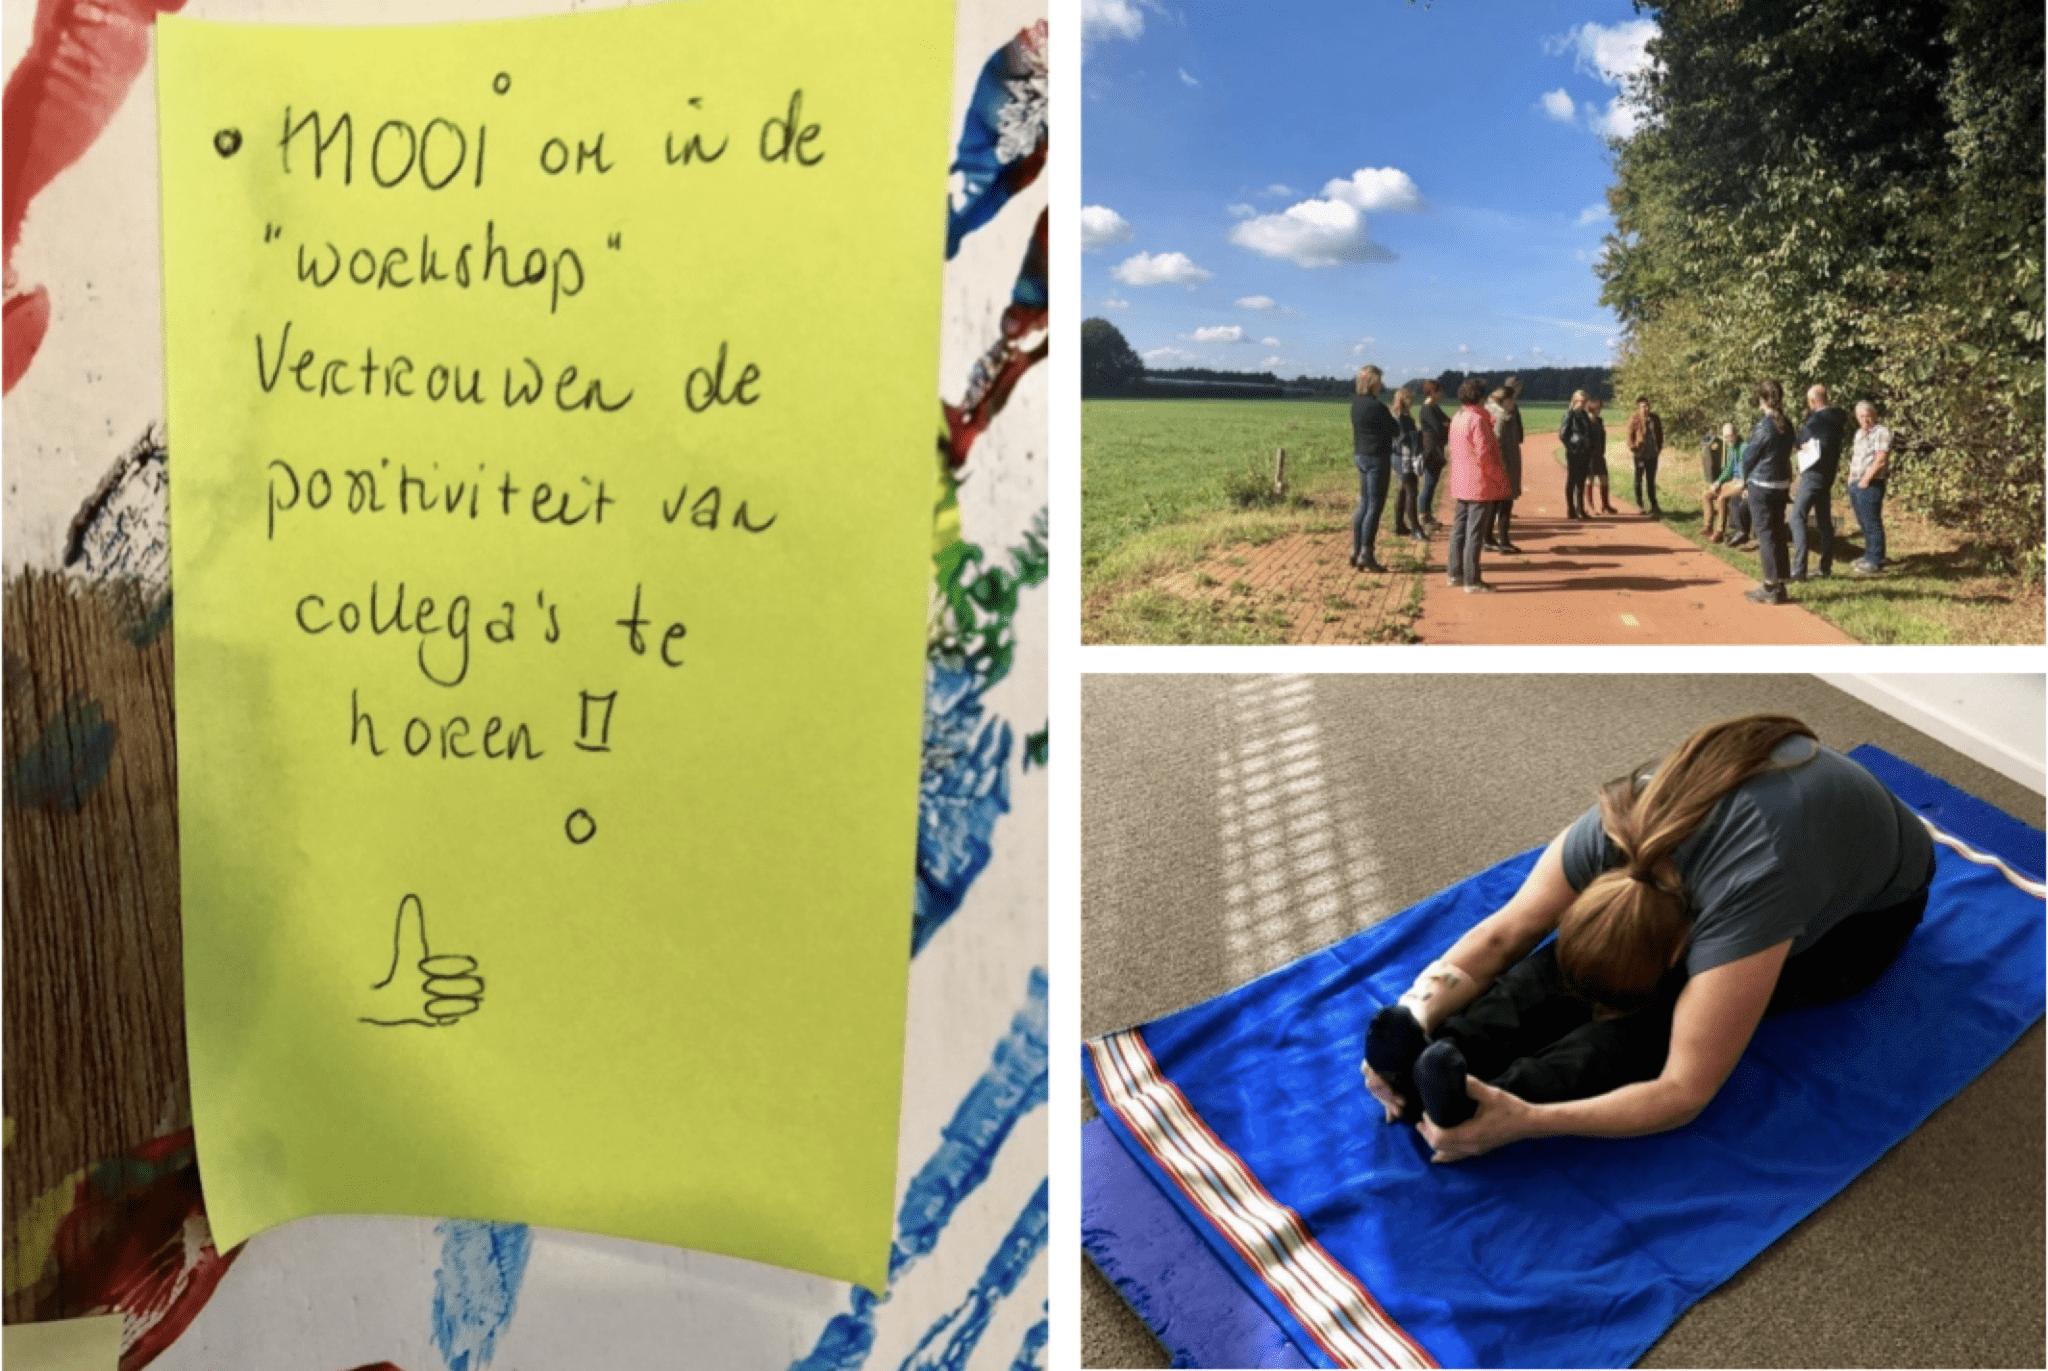 Week van het Werkgeluk in Roerdalen